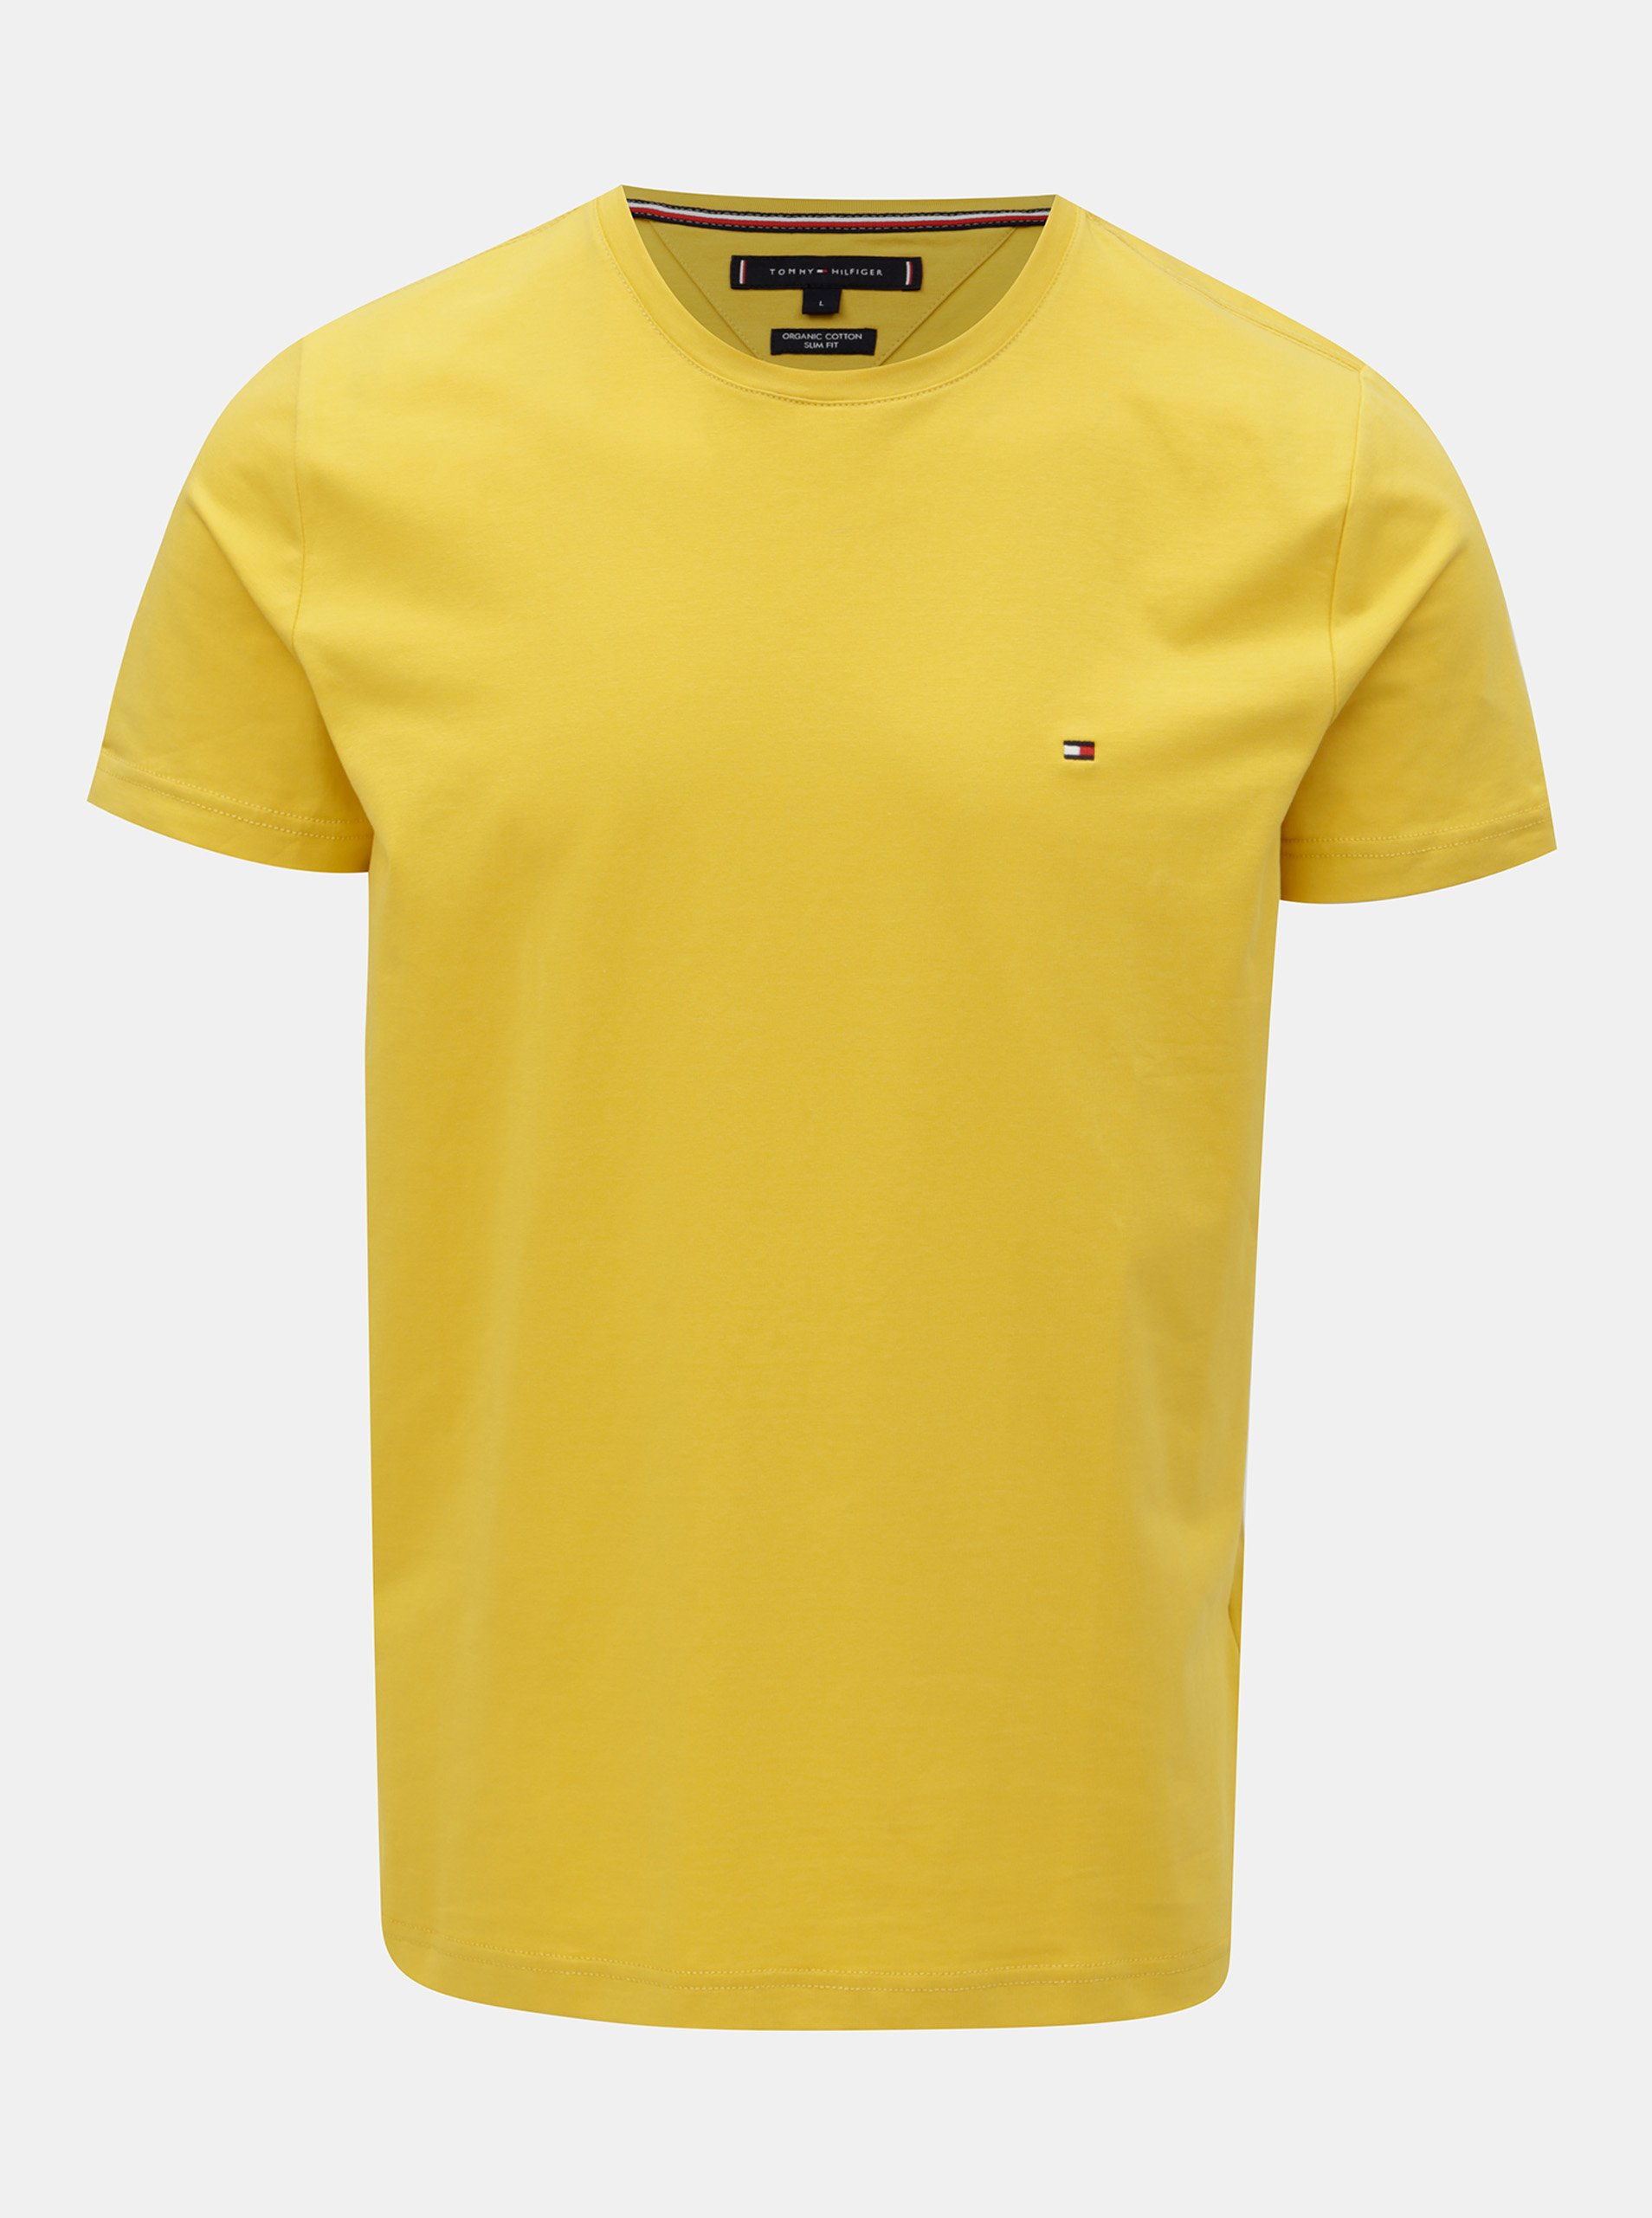 1f370f8c51 Žluté pánské slim fit basic tričko Tommy Hilfiger Tee - SLEVA ...